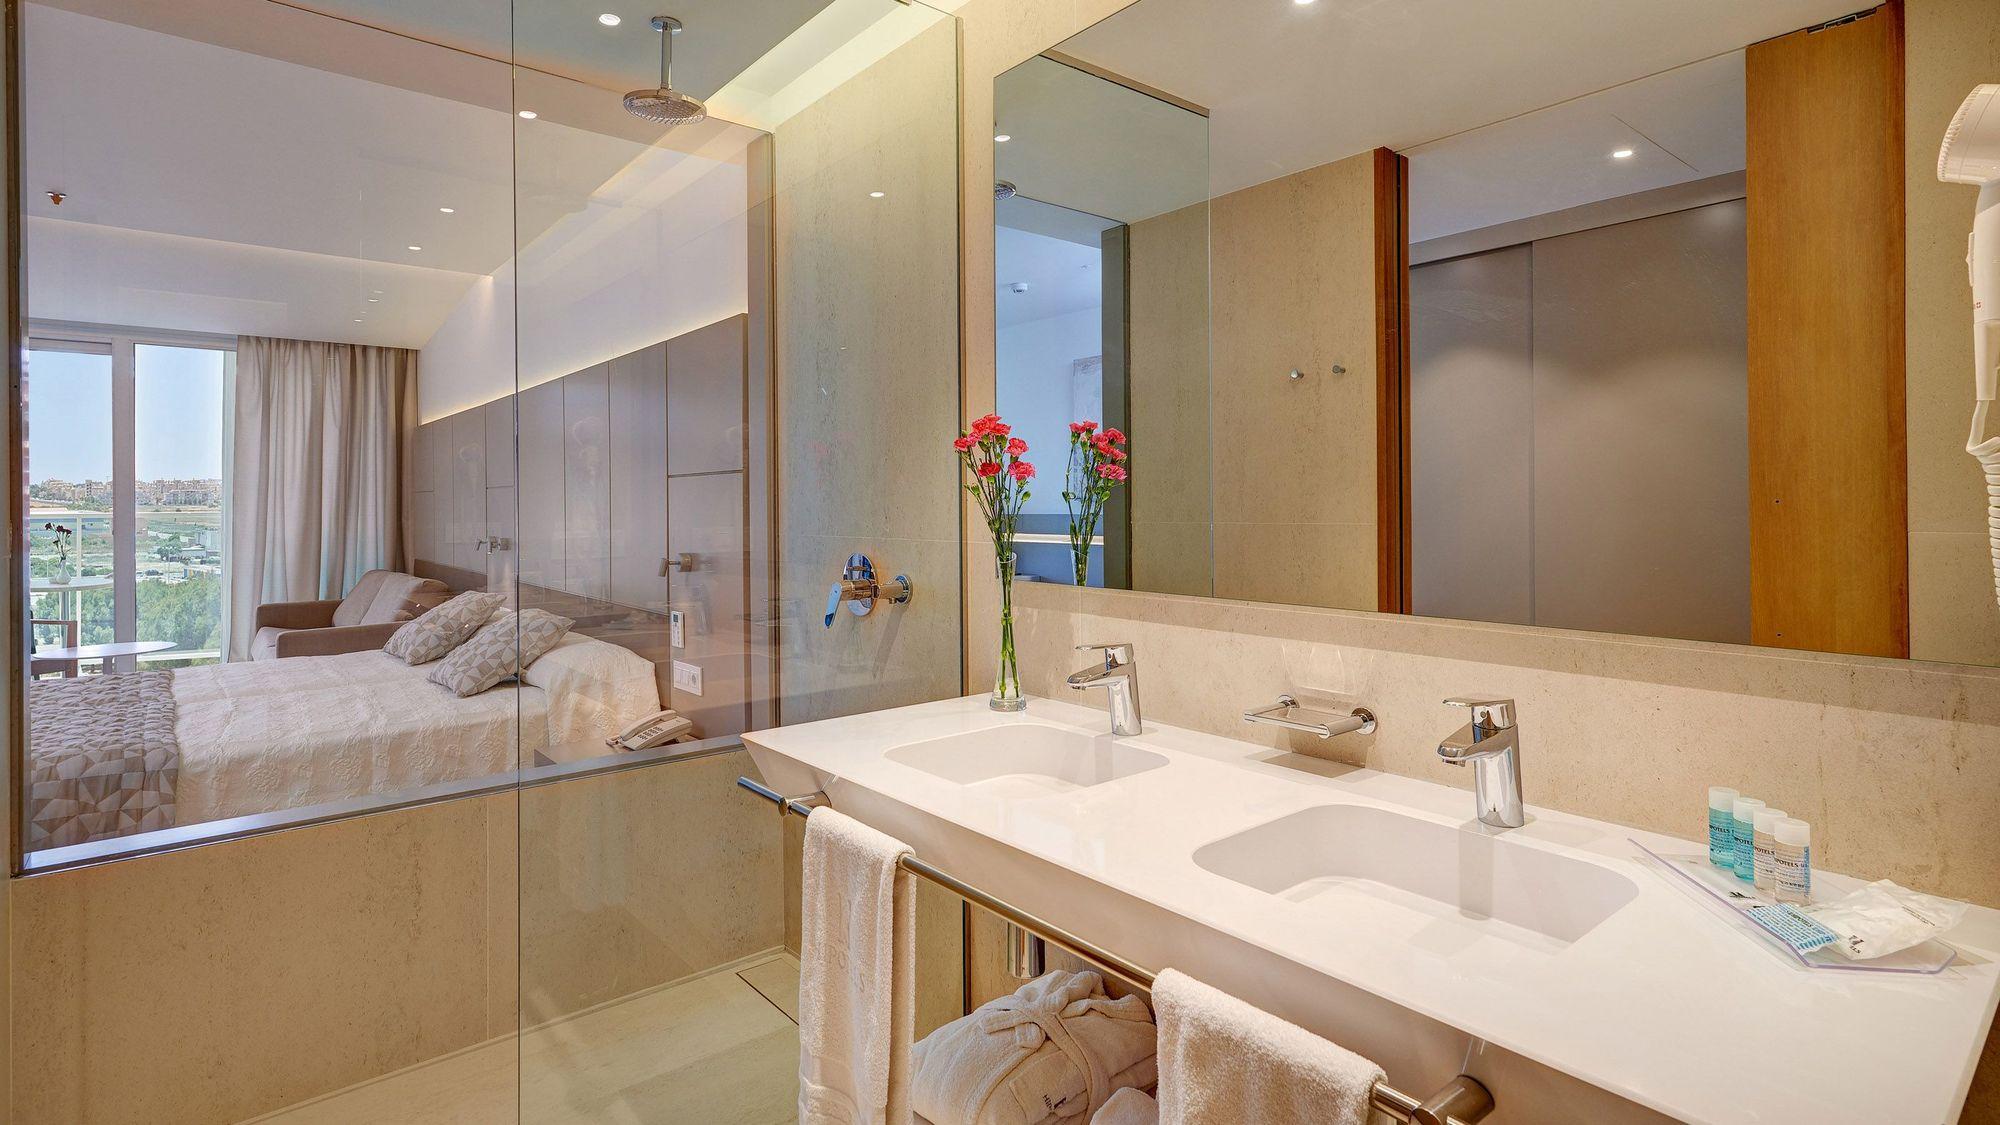 hipotels-gran-playa-de-palma-standard-double-room-bathroom-2.jpg